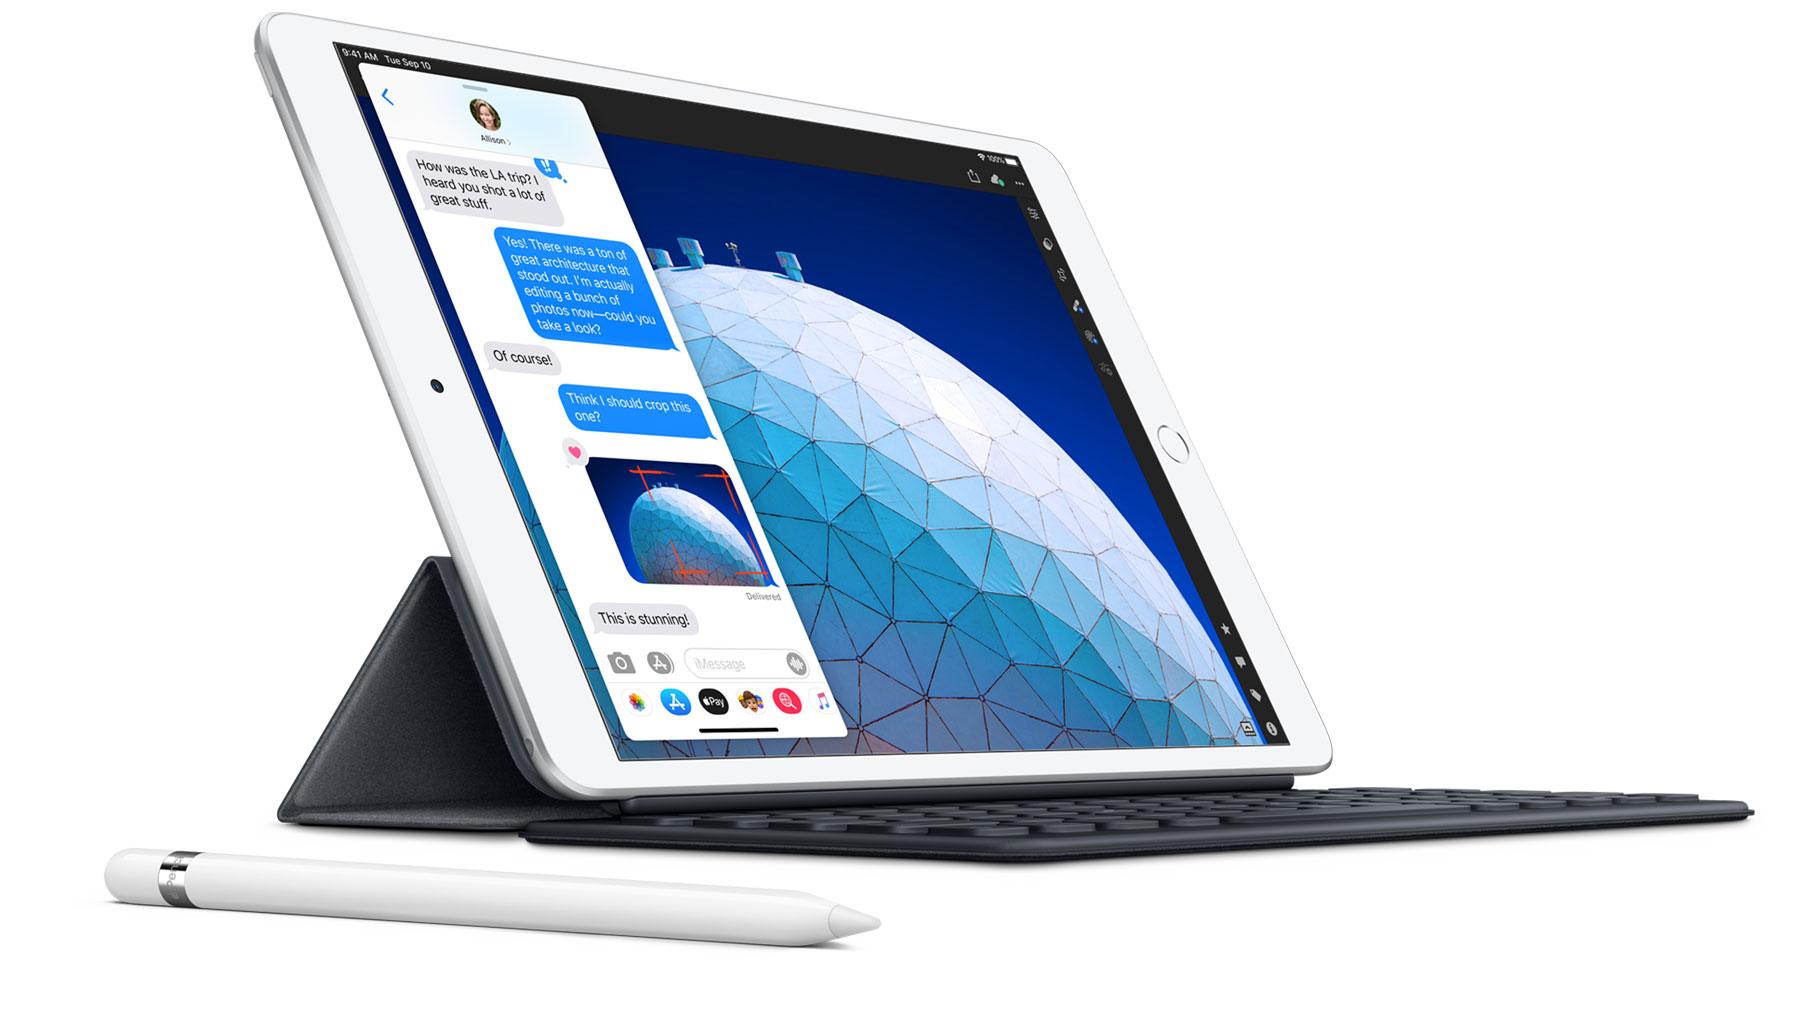 https://www.macfreak.nl/modules/news/images/zArt.iPadAir2019.jpg